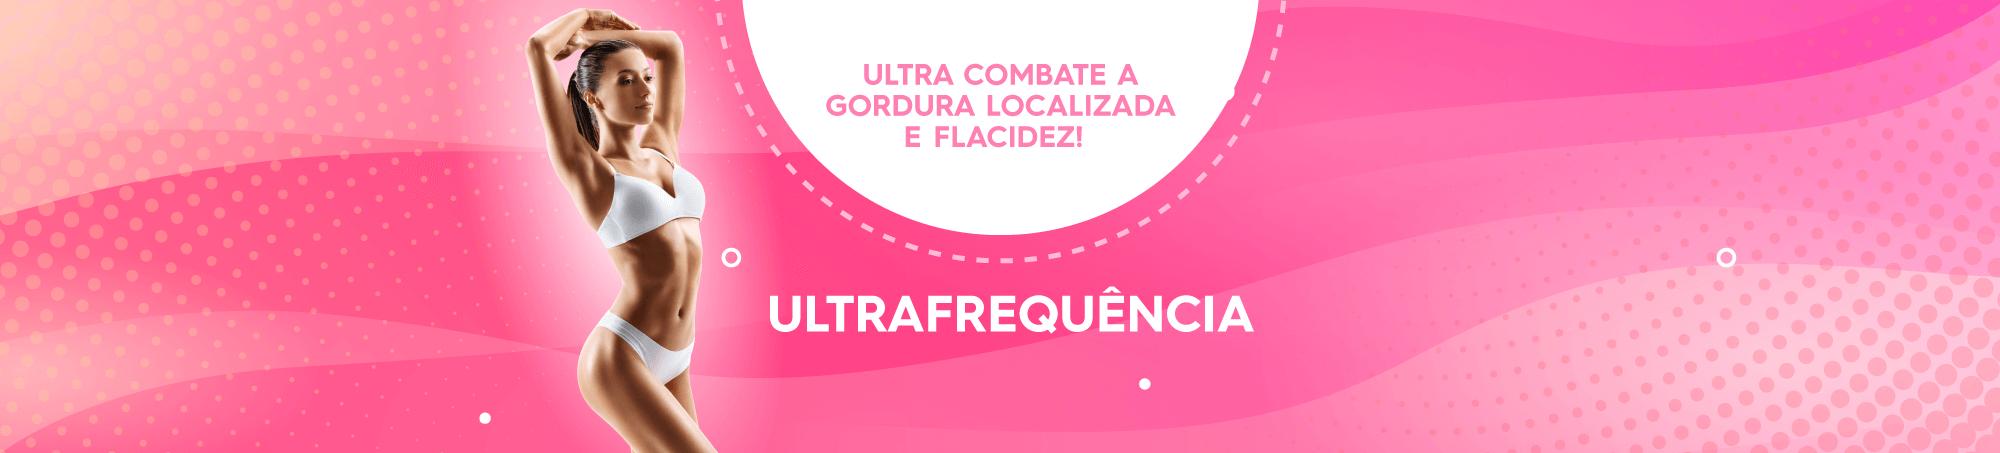 Ultrafrequencia-Fisest-site